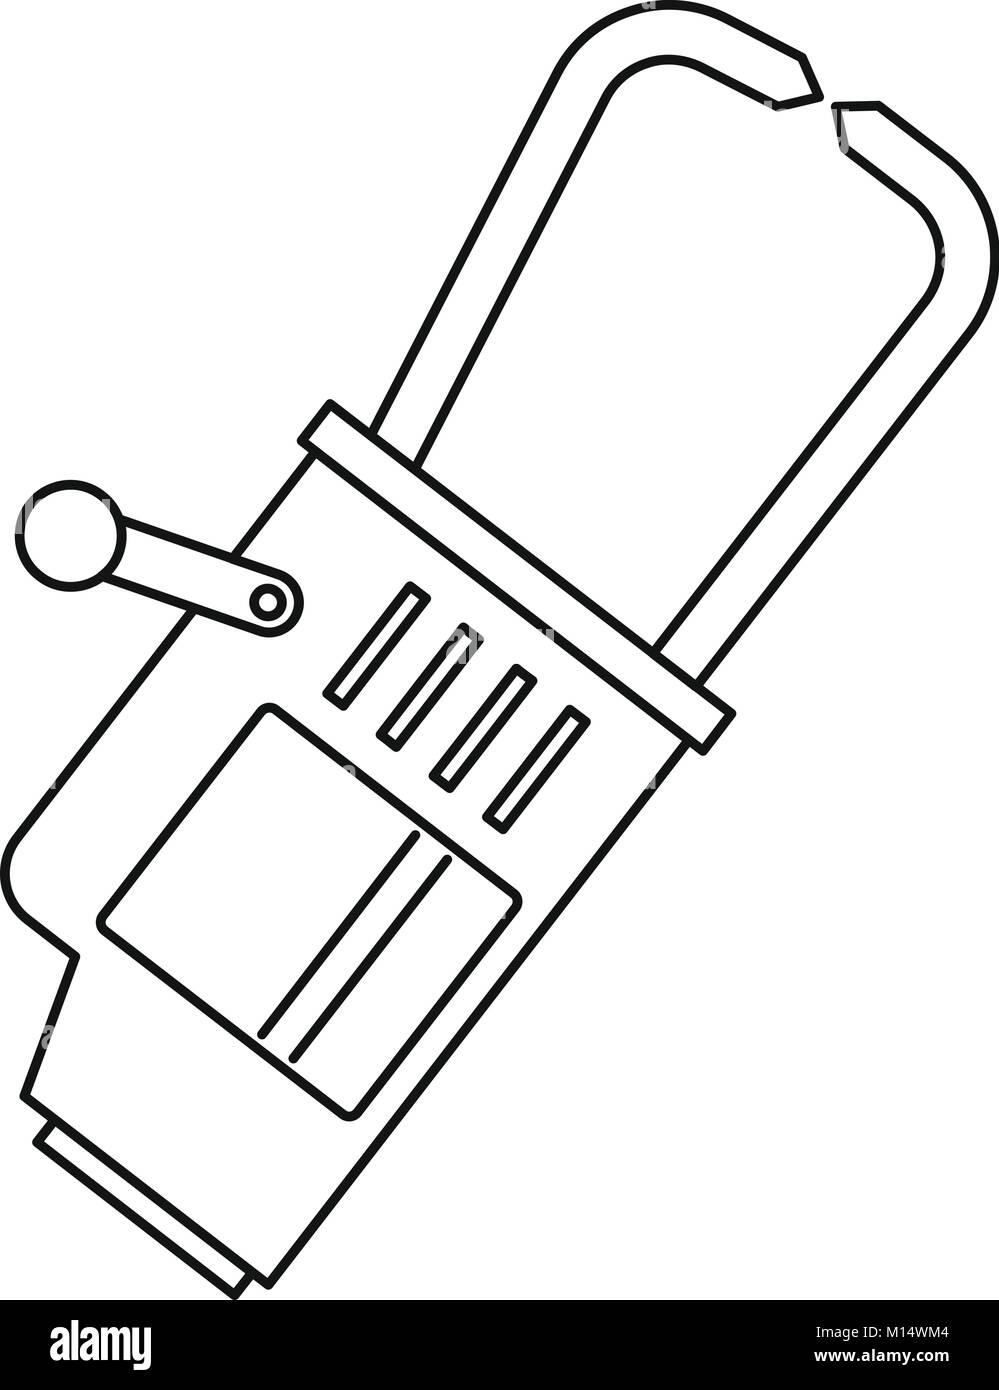 Welding equipment icon outline - Stock Image